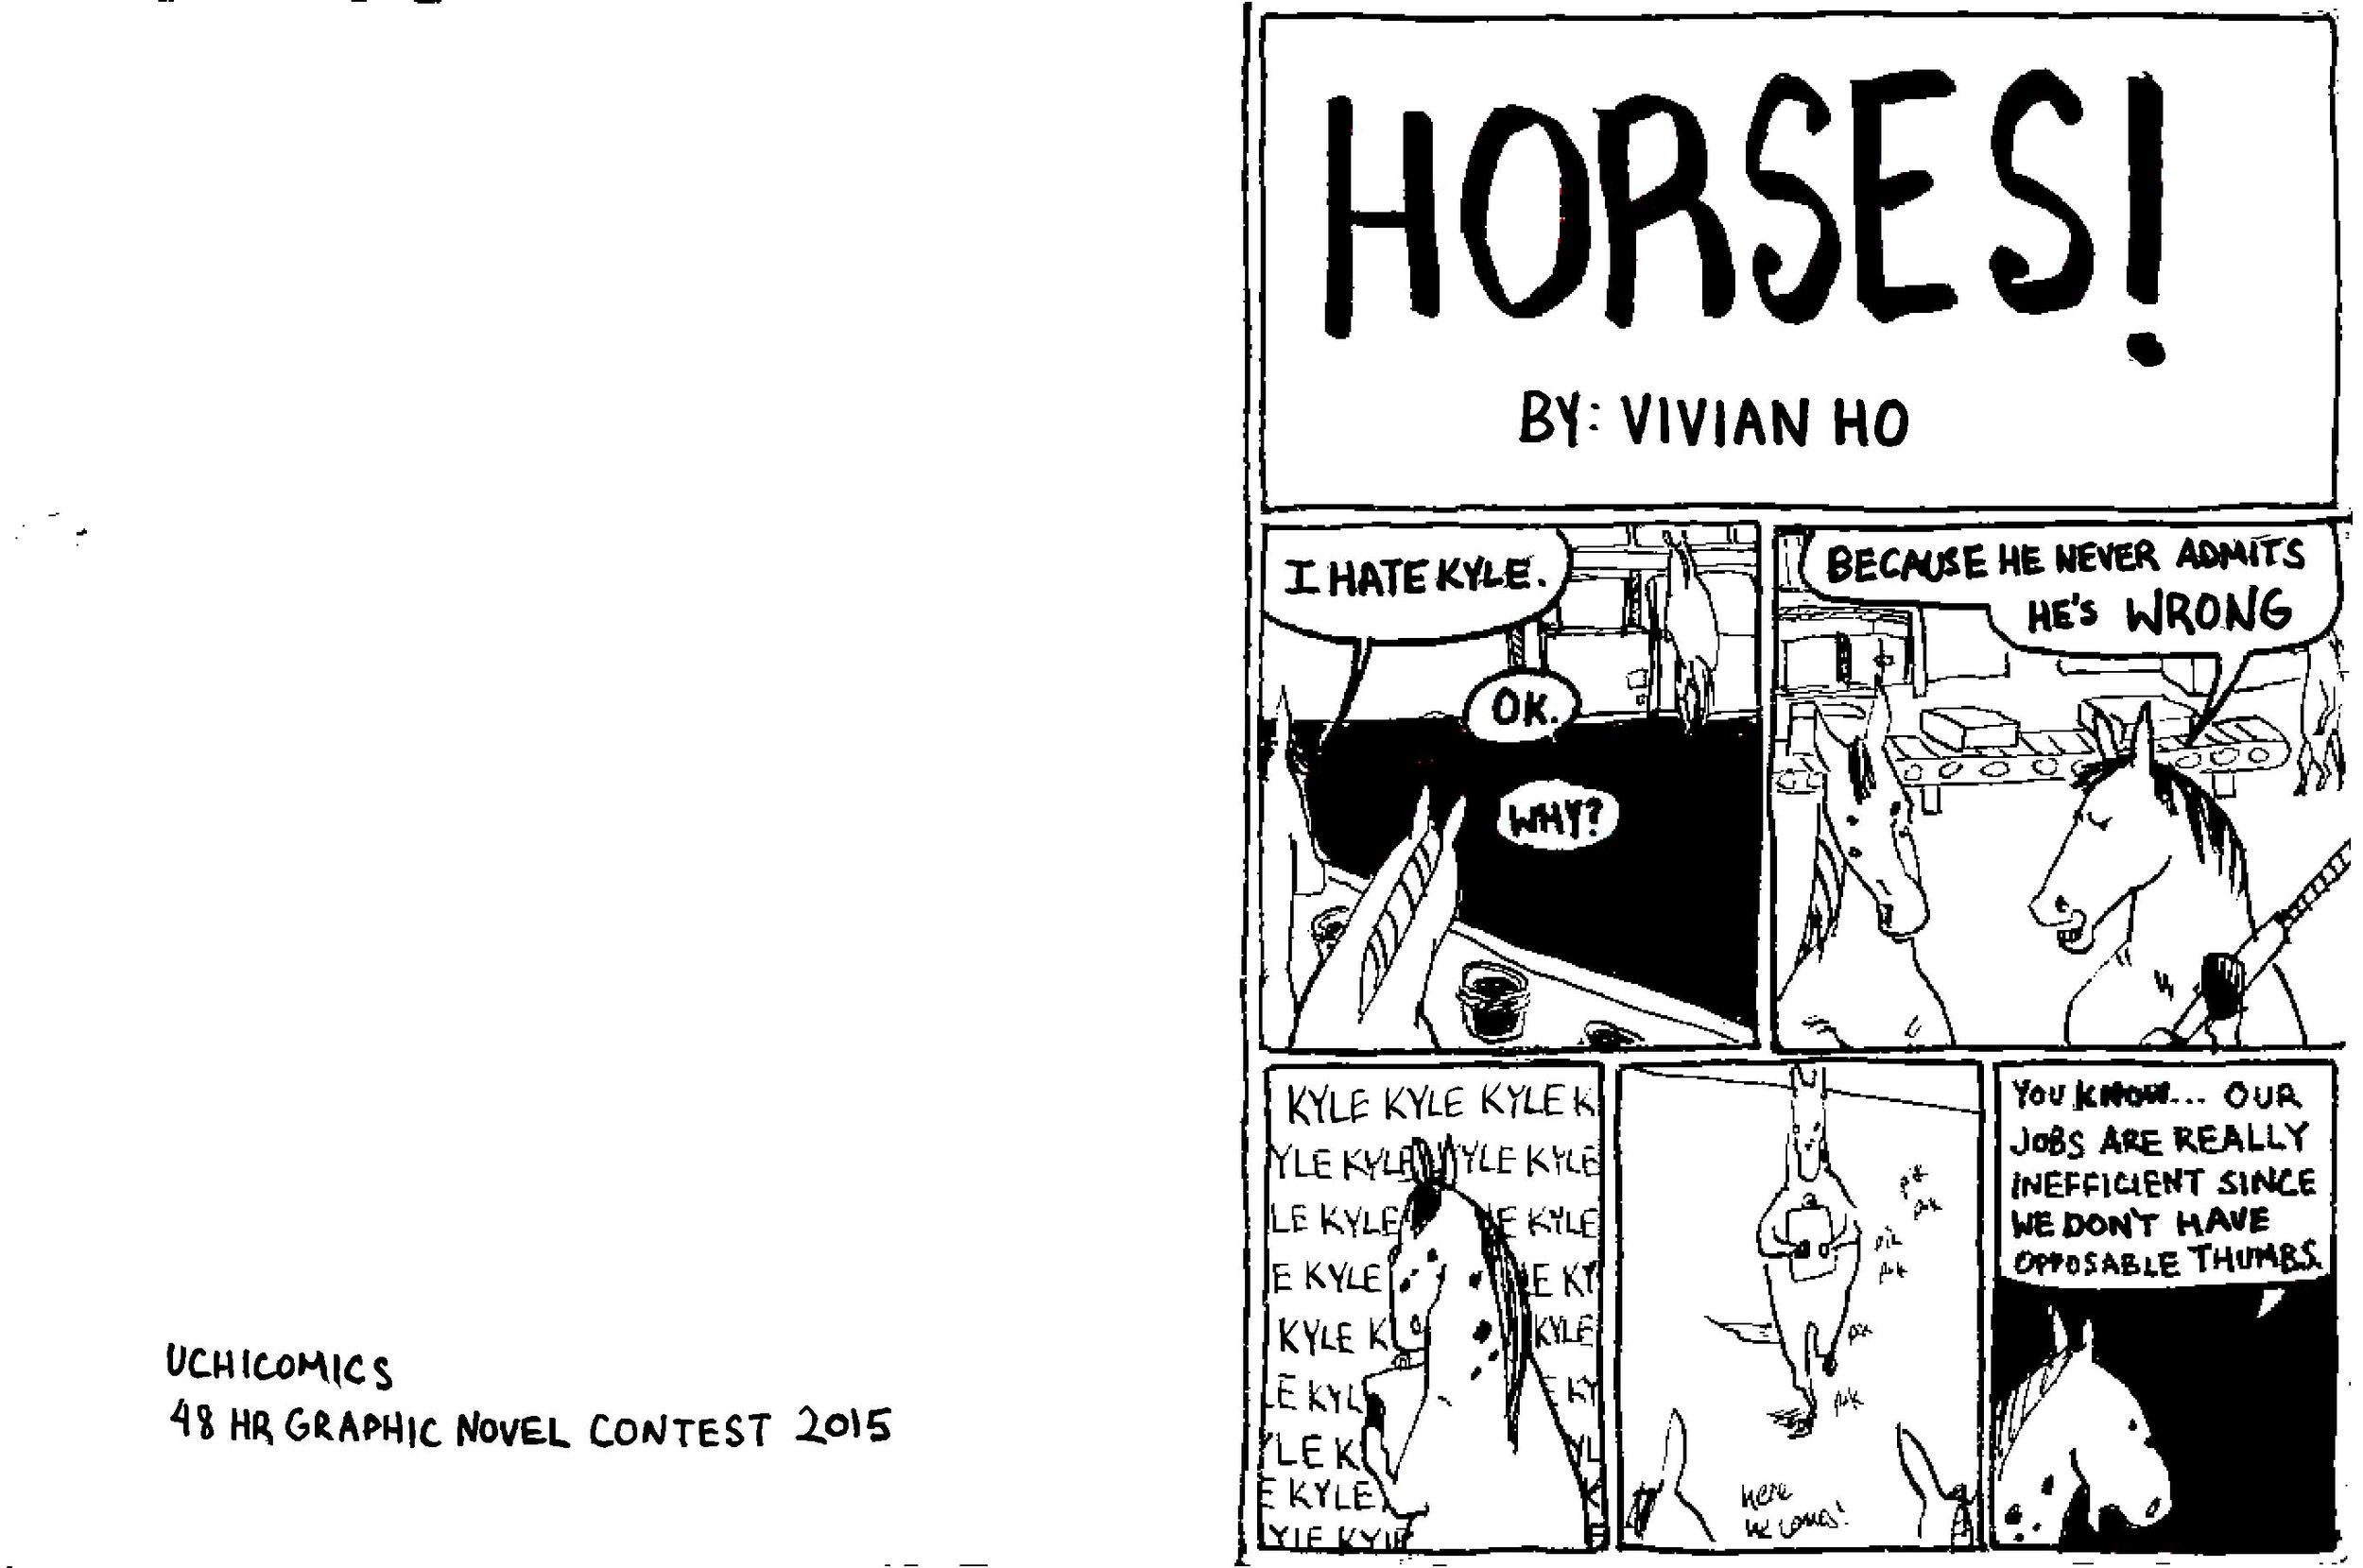 Horses! 2015